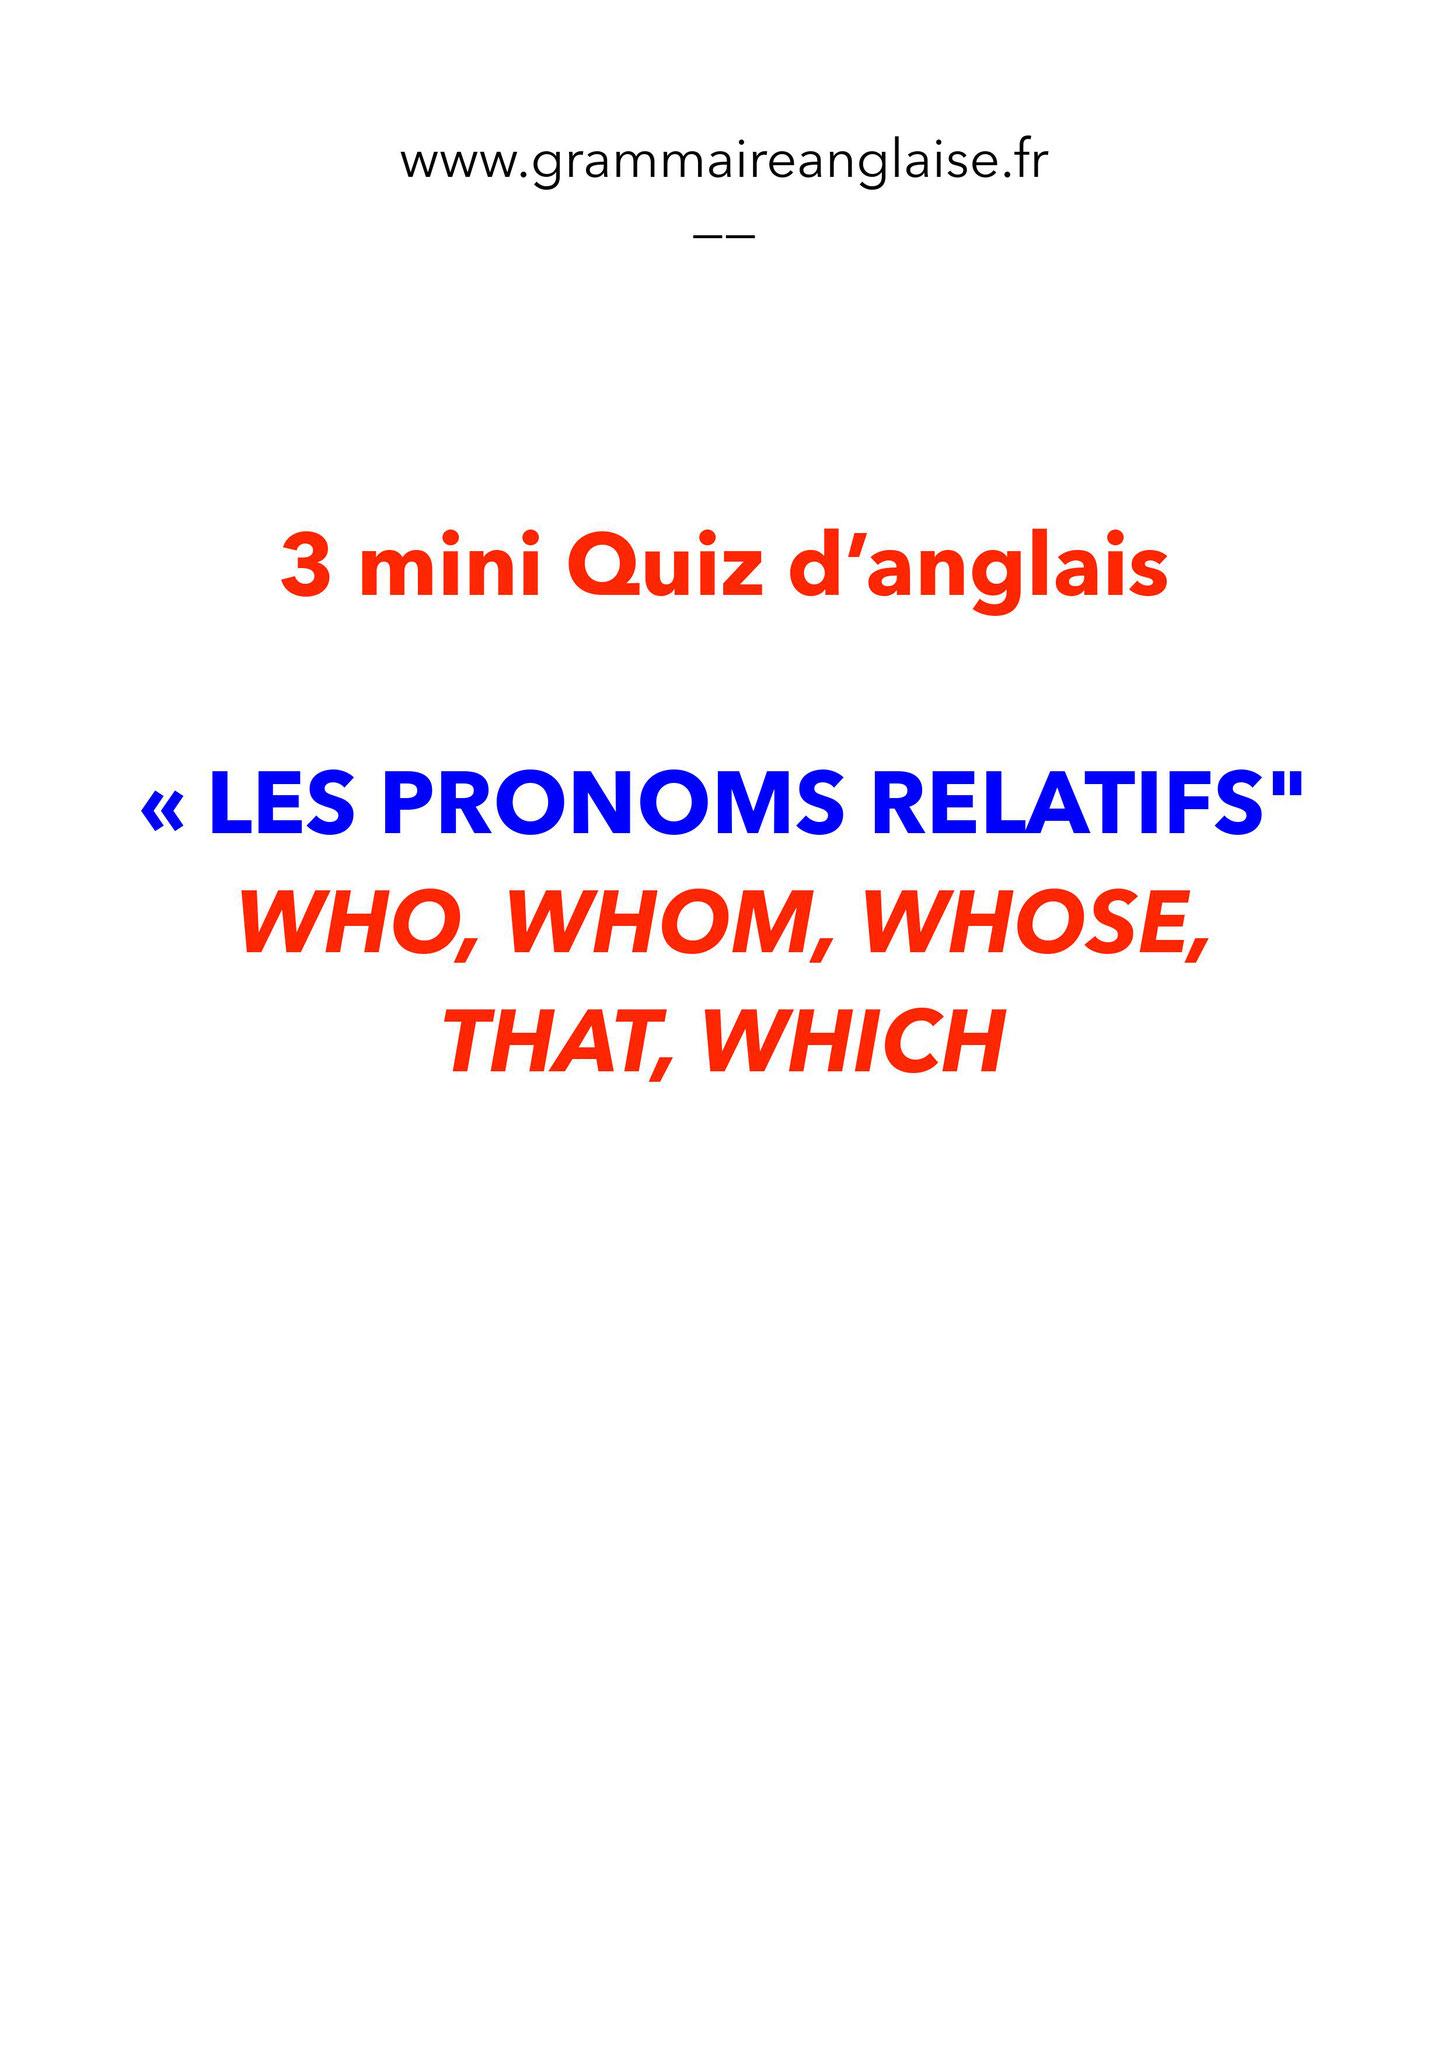 "3 mini Quiz d'anglais  «LES PRONOMS RELATIFS"" WHO, WHOM, WHOSE,  THAT, WHICH"